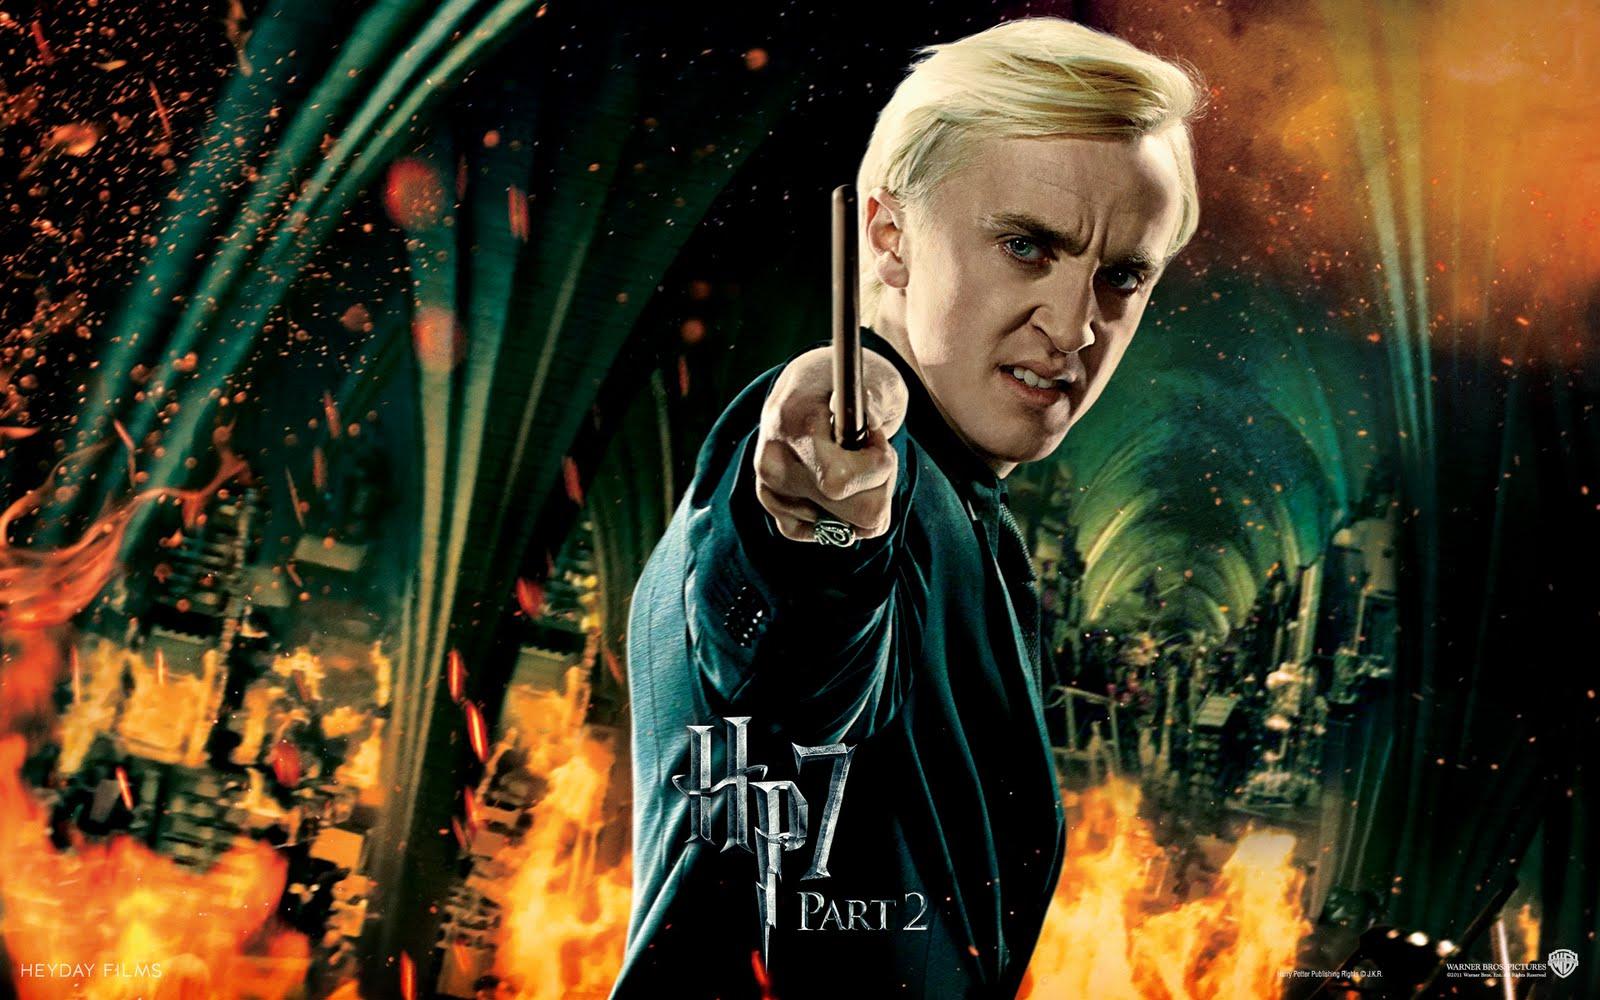 Beautiful Wallpaper Harry Potter Deathly Hallows - latest?cb\u003d20120102111441  Trends_39368.jpg/revision/latest?cb\u003d20120102111441